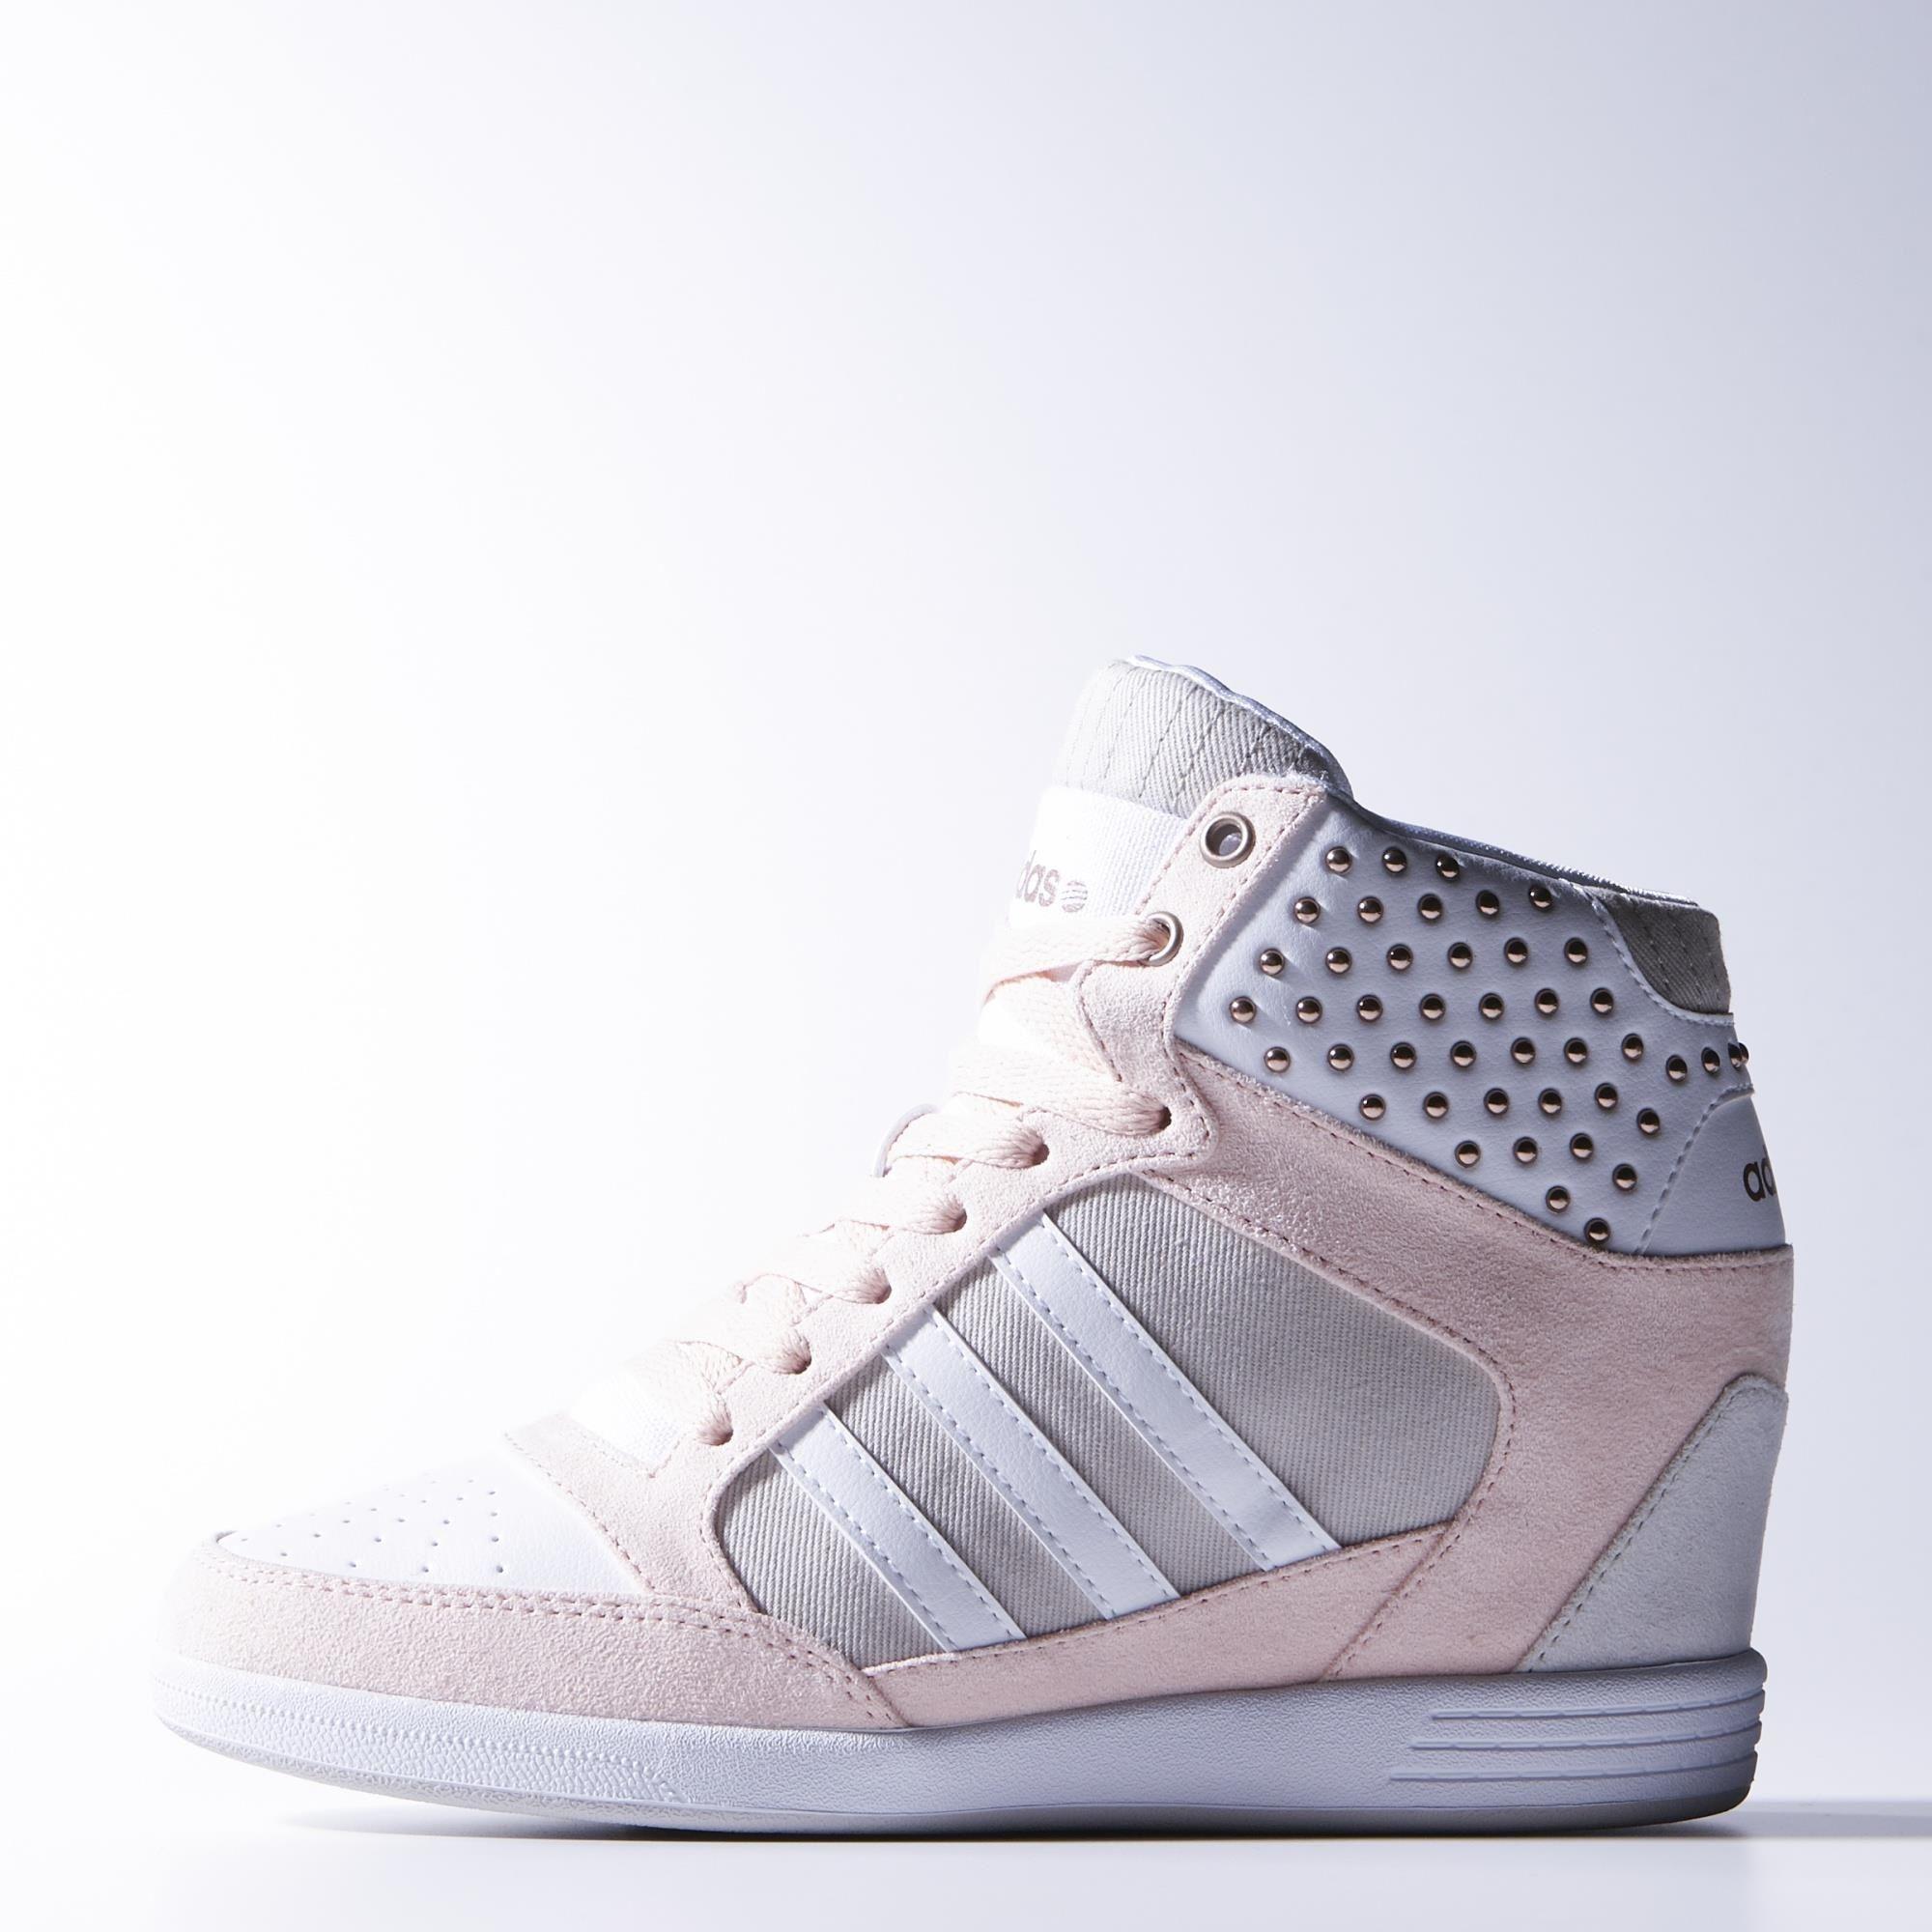 promo code 6ca38 7c939 ... adidas - Buty Super Wedge · Adidas NeoAdidas ShoesTop ... Adidas NEO  Super Wedge Shoes in Core BlackAmazon Red ...